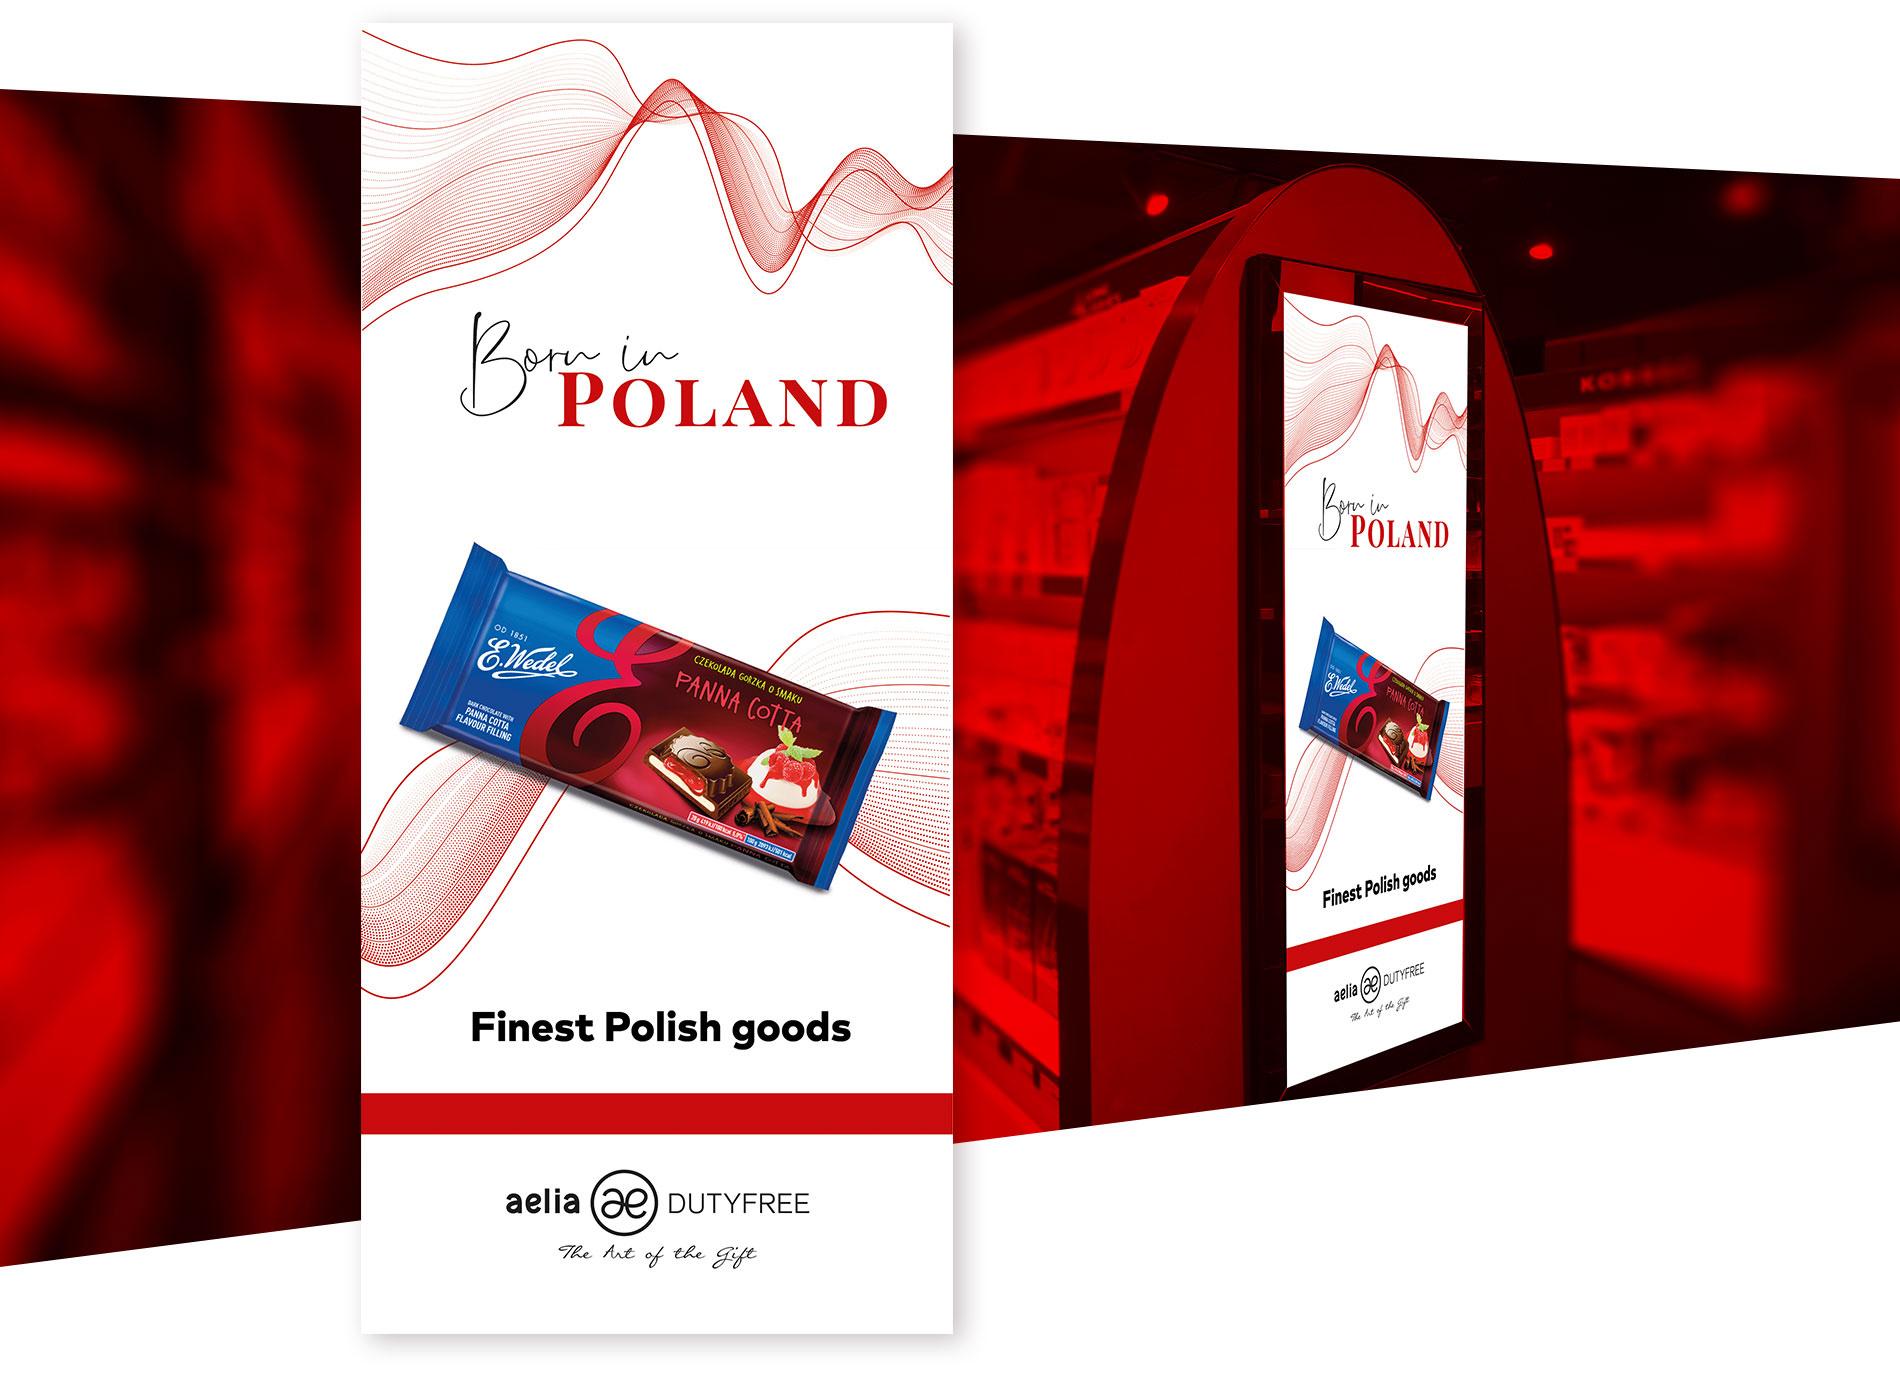 https://peppermint.pl/wp-content/uploads/2019/07/3_PROJEKT_AELIA_BORN_IN_POLAND.jpg